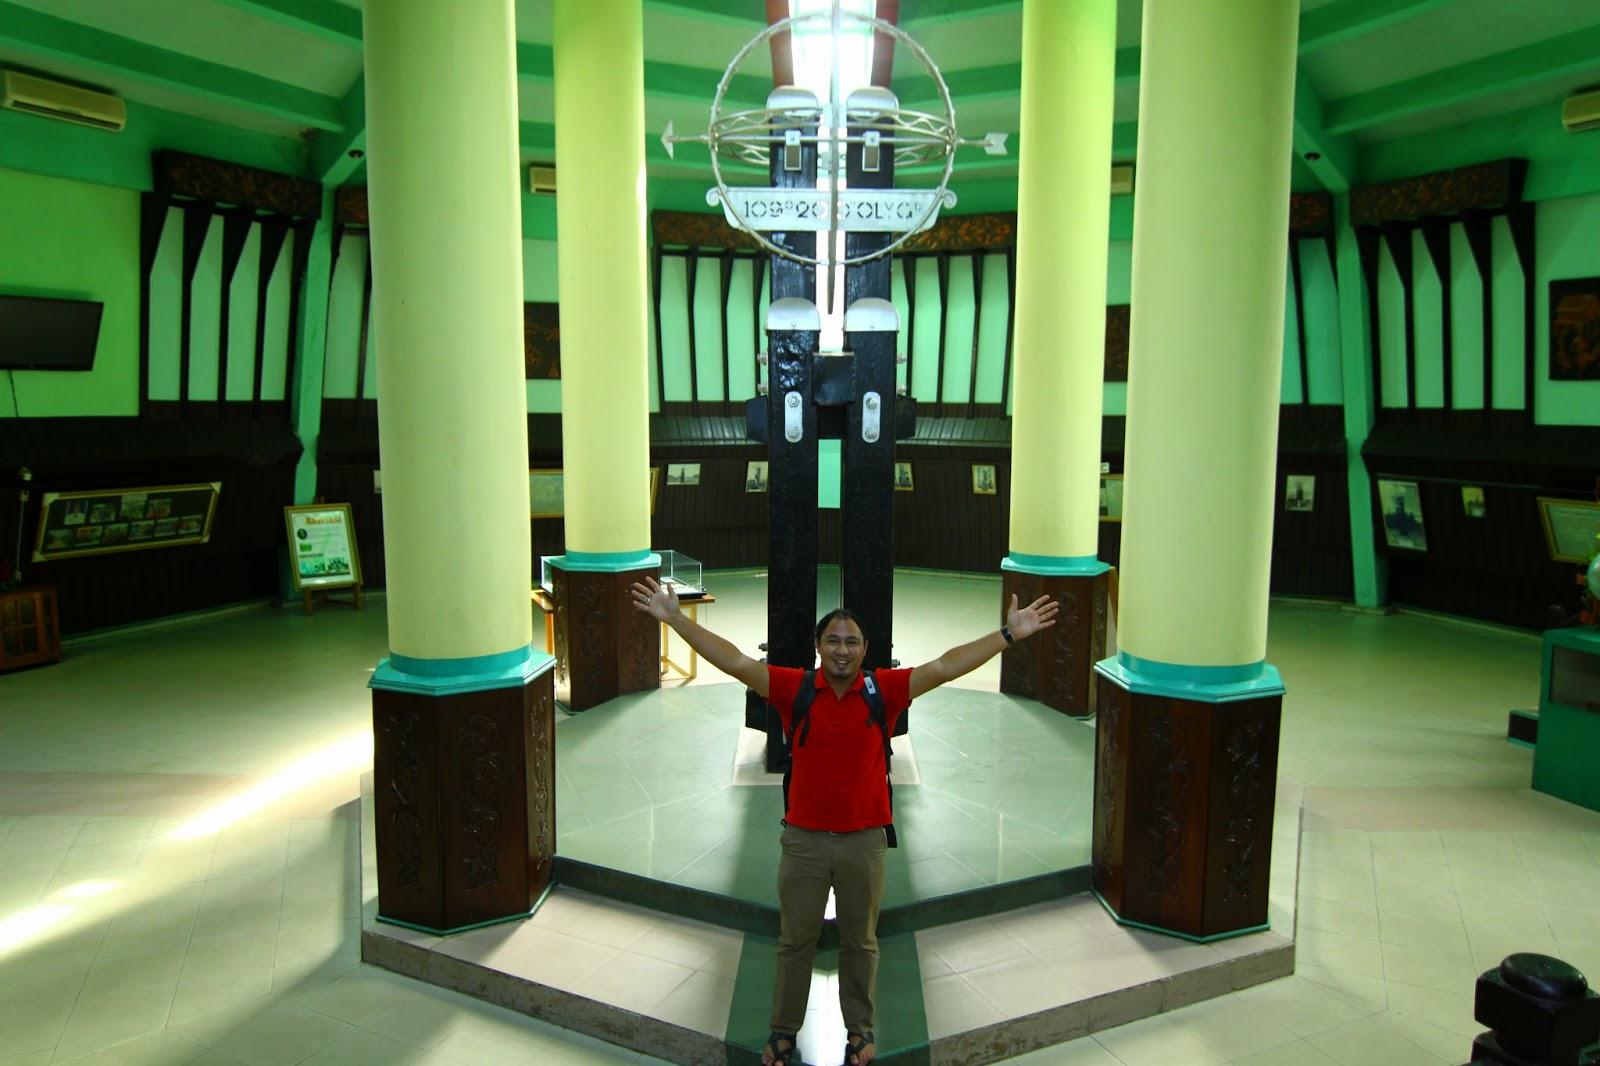 Tugu Khatulistiwa, Kota Pontianak, Kalimantan Barat, Indonesia